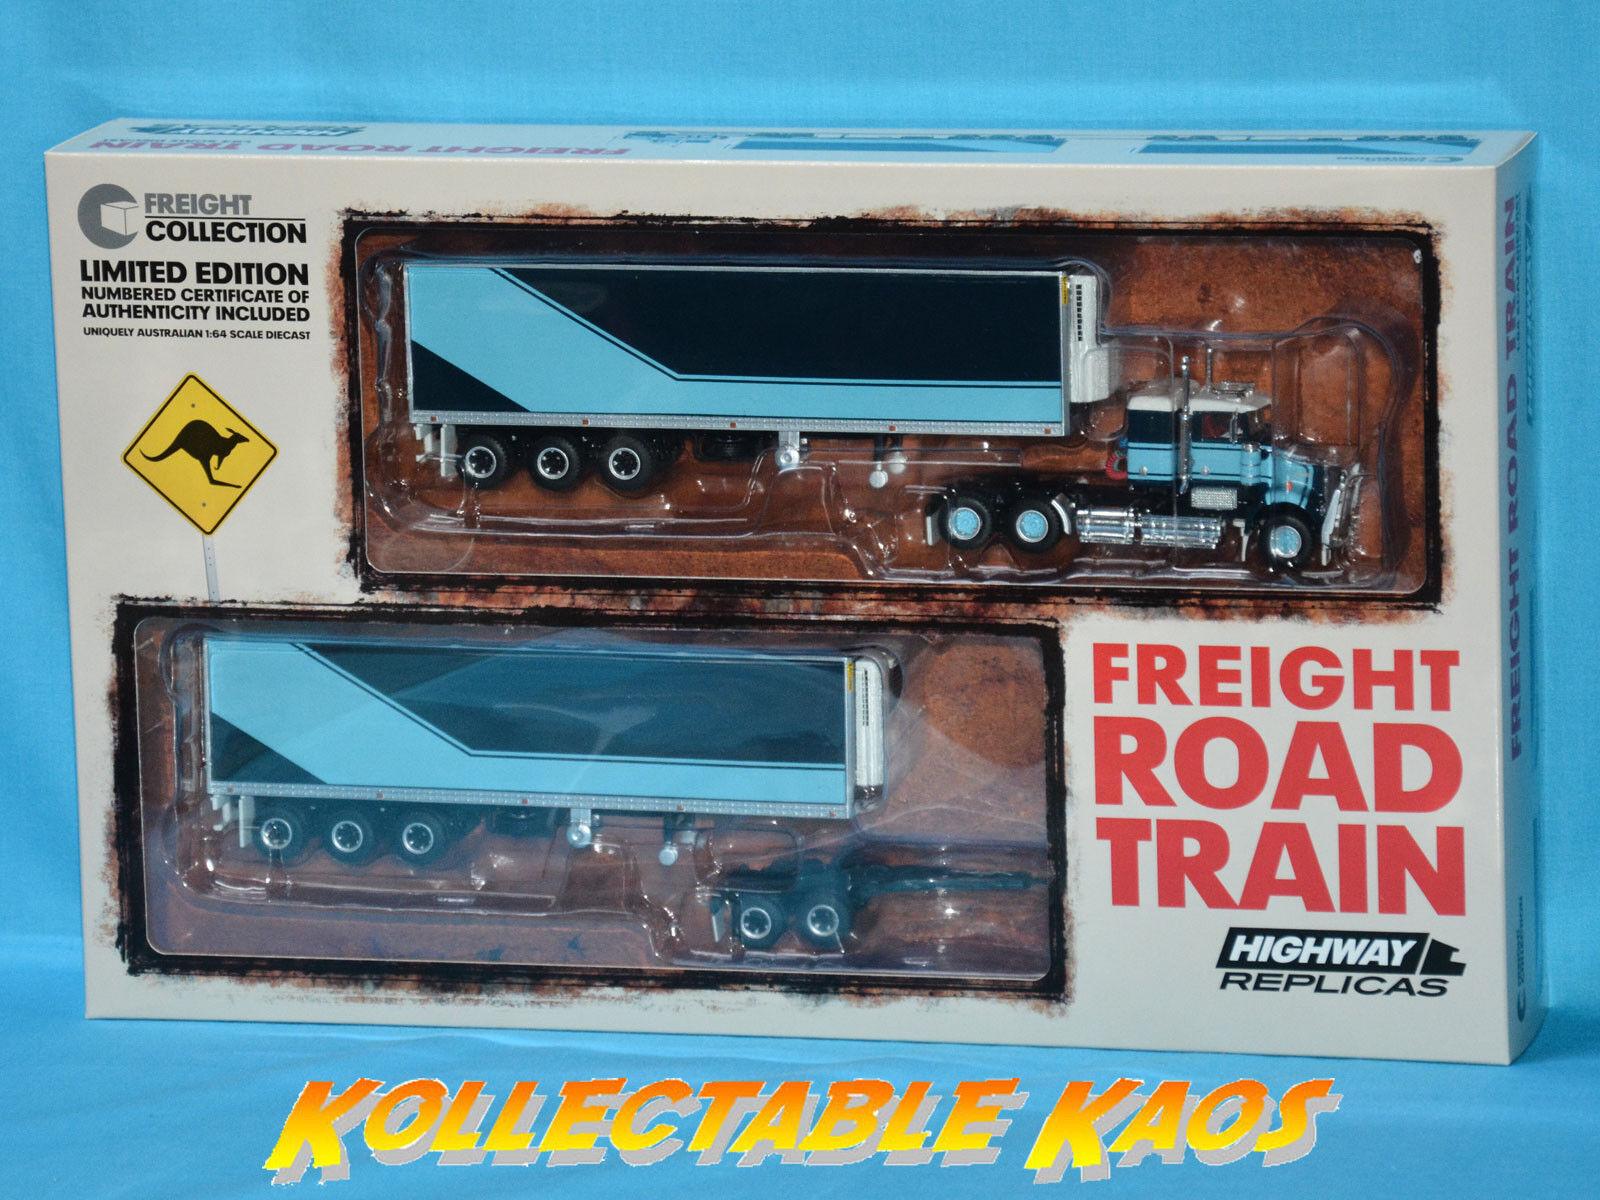 1 64 Highway Replicas - Freight Road Train - Two Tone blu